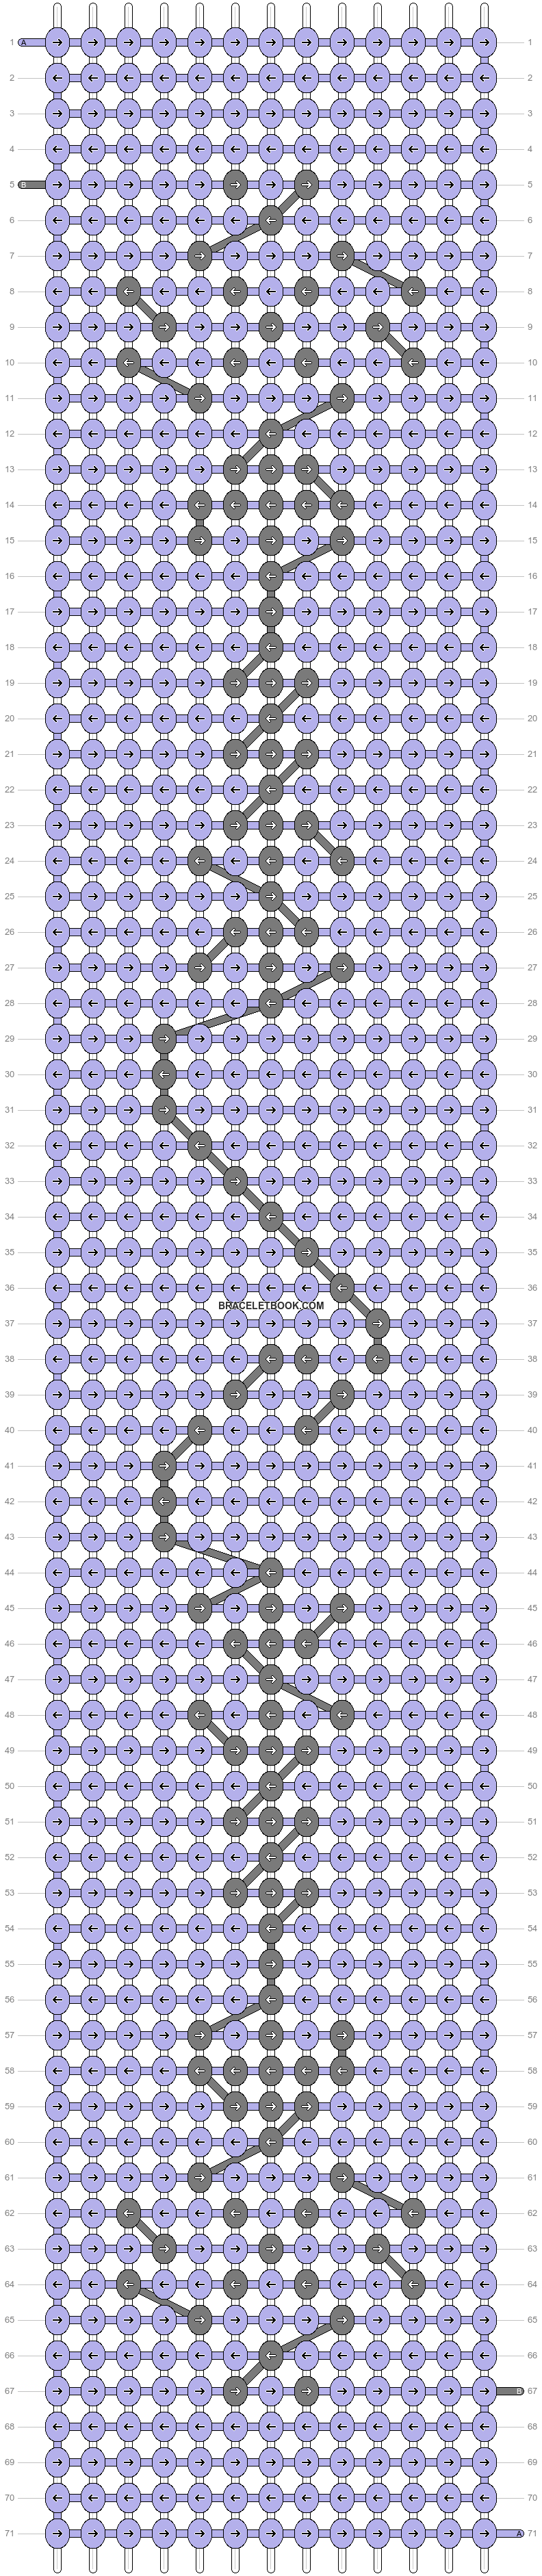 Alpha pattern #57396 variation #100227 pattern